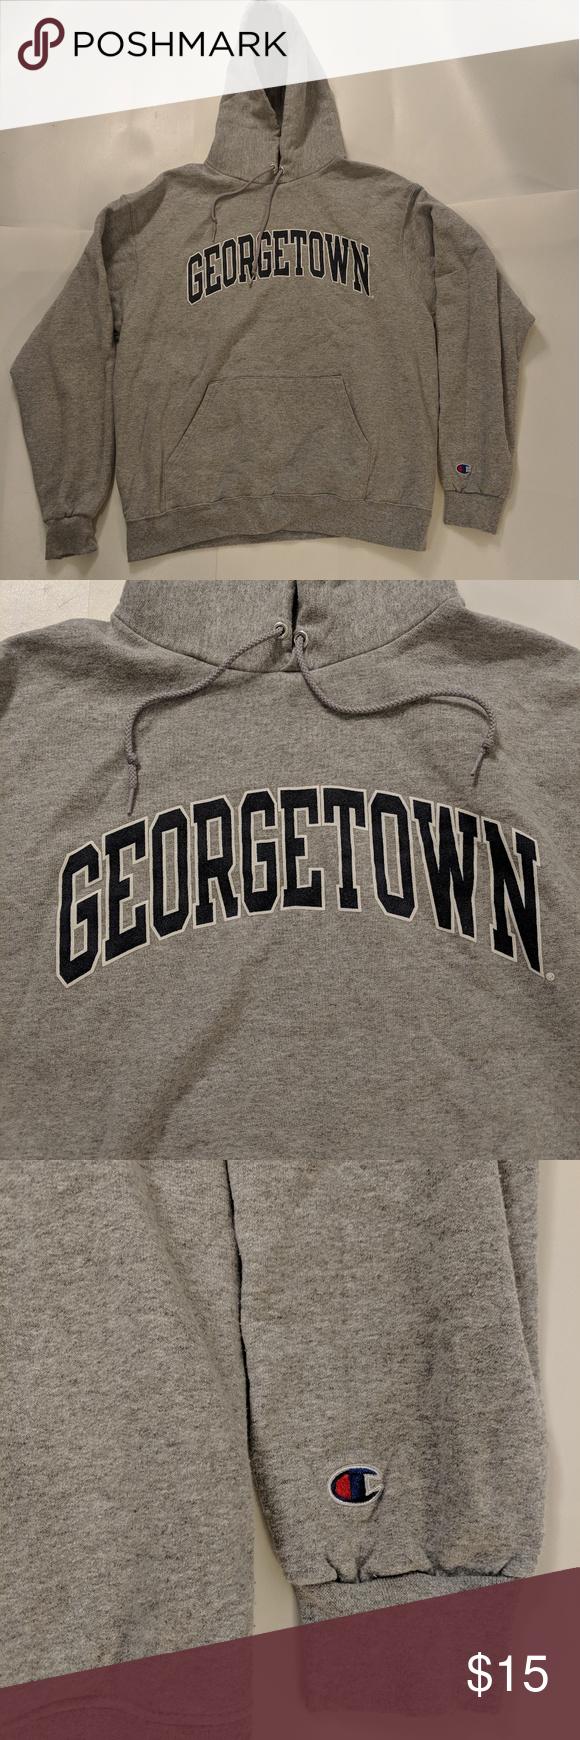 Georgetown Champion Eco Hoodie Sweatshirt Sz L Georgetown Hoyas Champion Eco Hoodie In Very Good Pre Owned Con Sweatshirts Sweatshirts Hoodie Sweatshirt Shirt [ 1740 x 580 Pixel ]